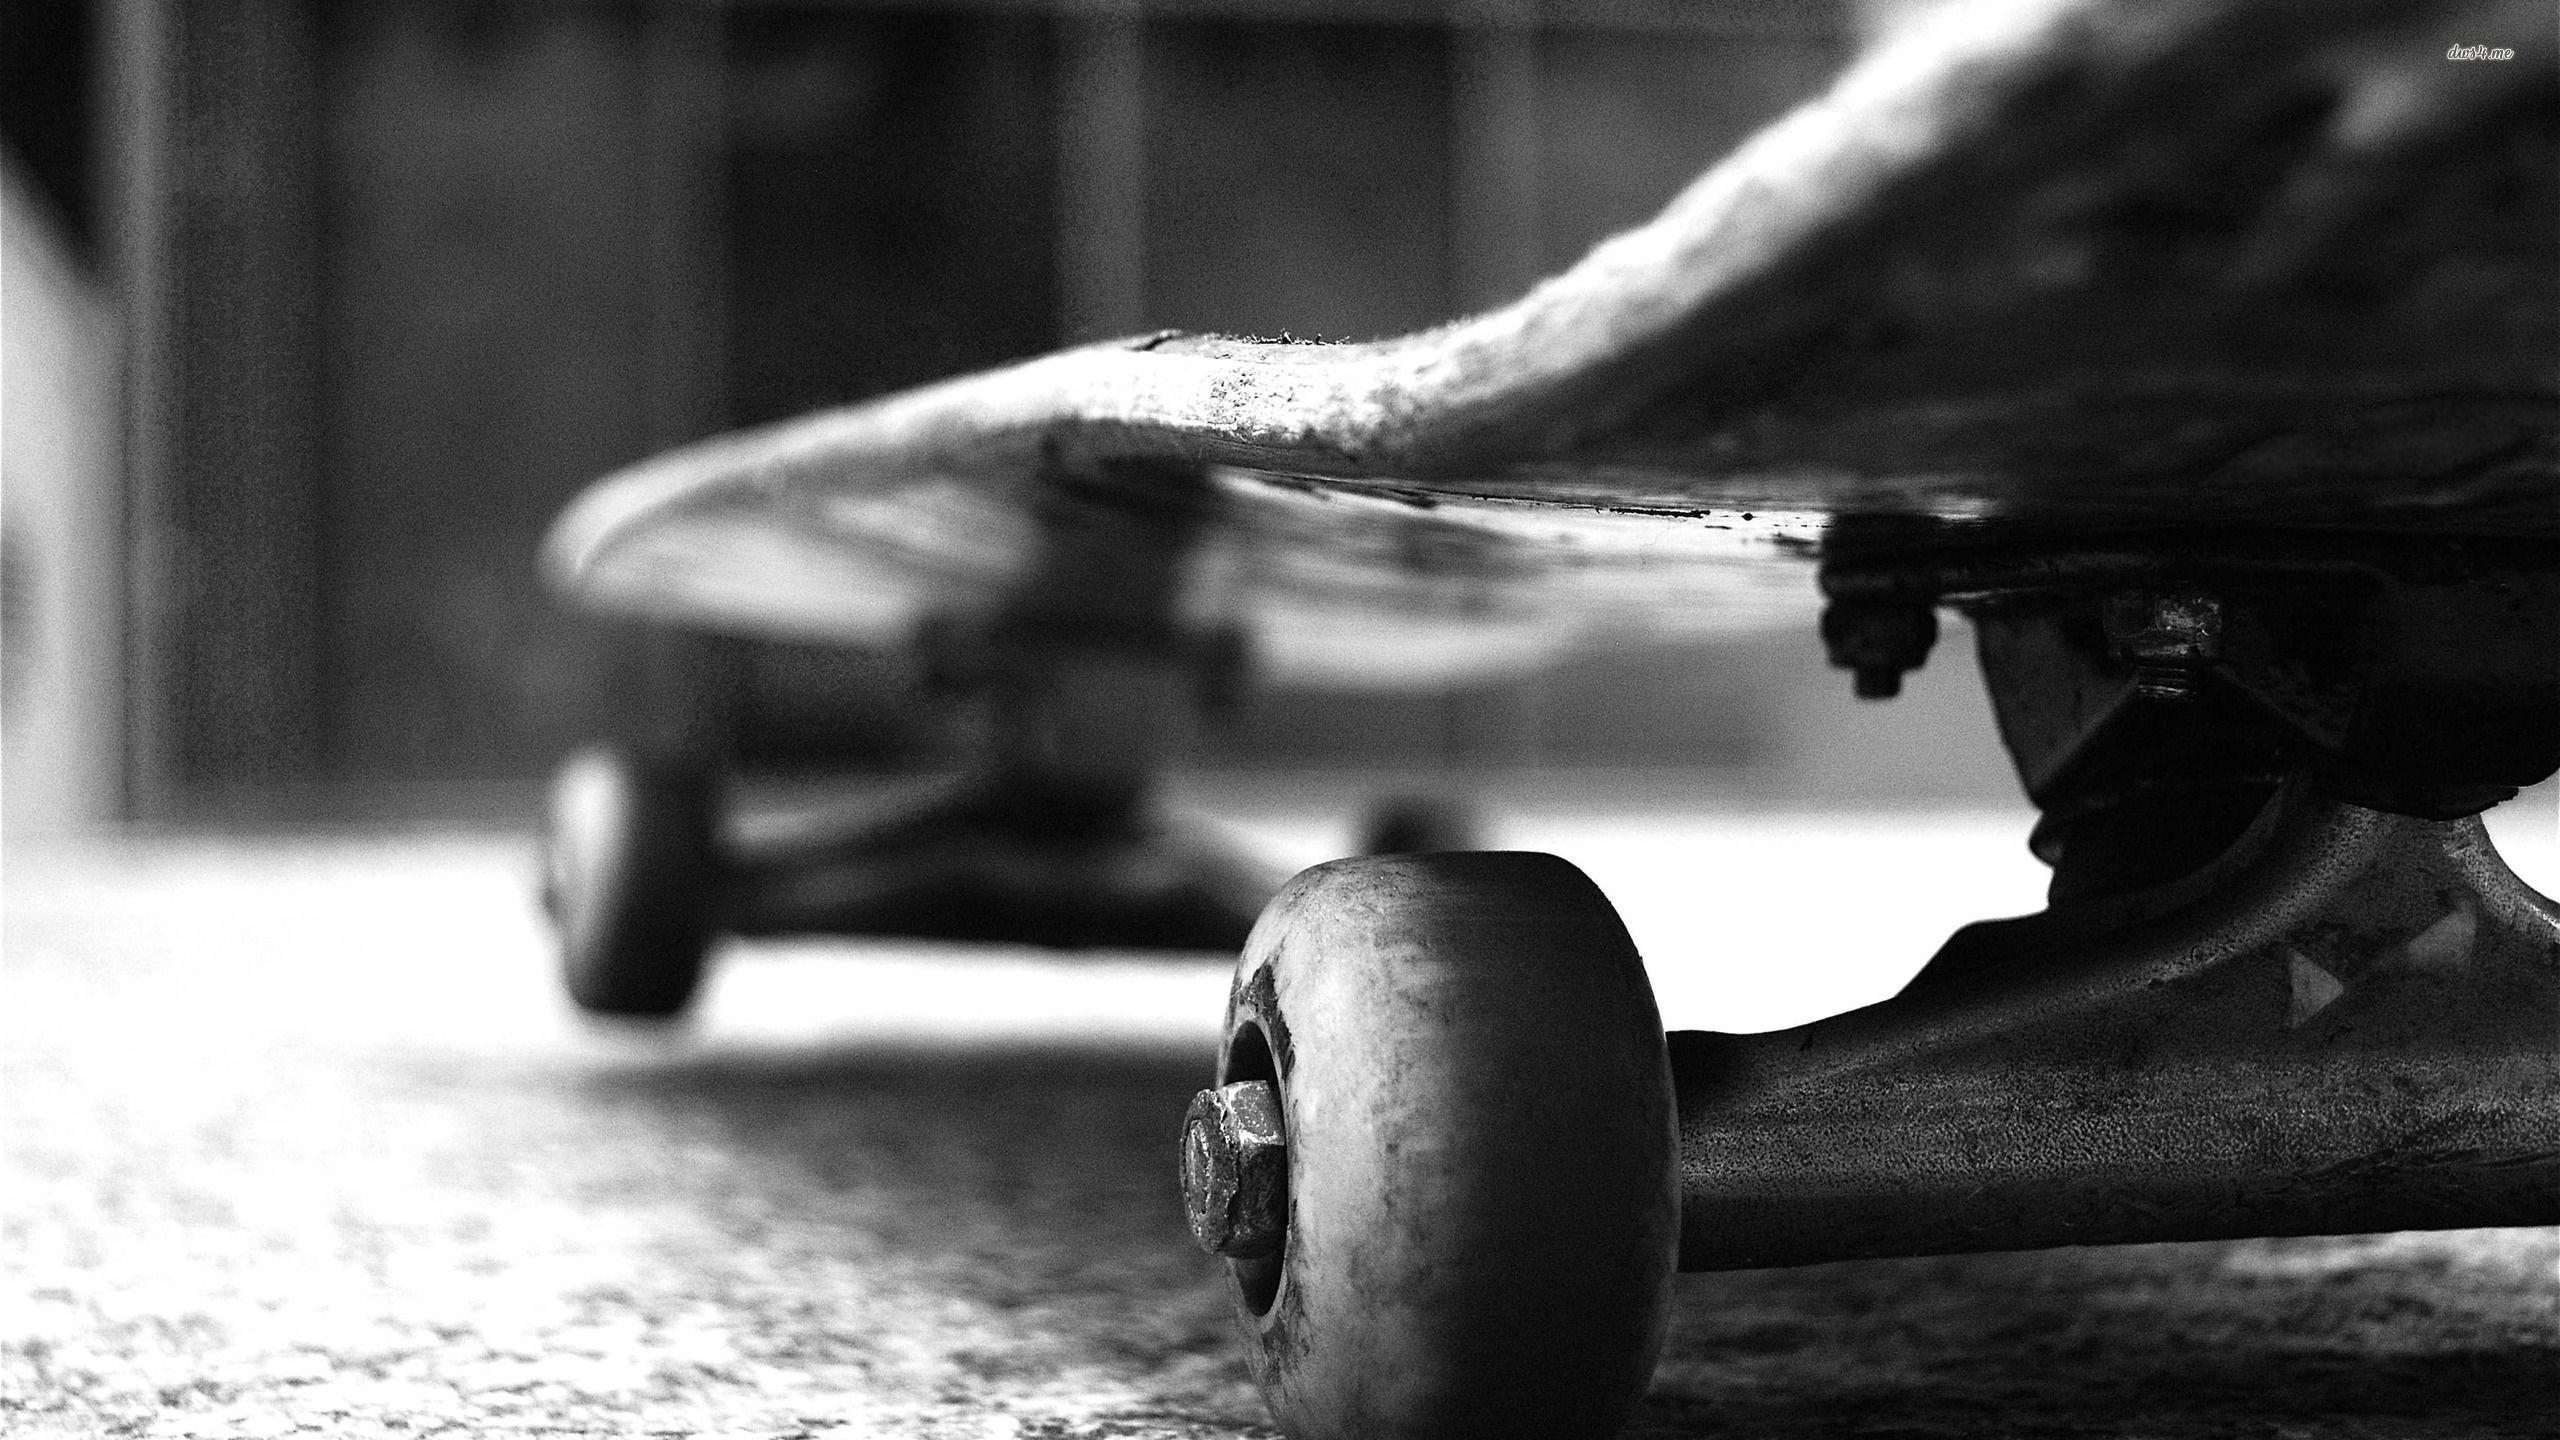 Skate Wallpaper Desktop (60+ images)